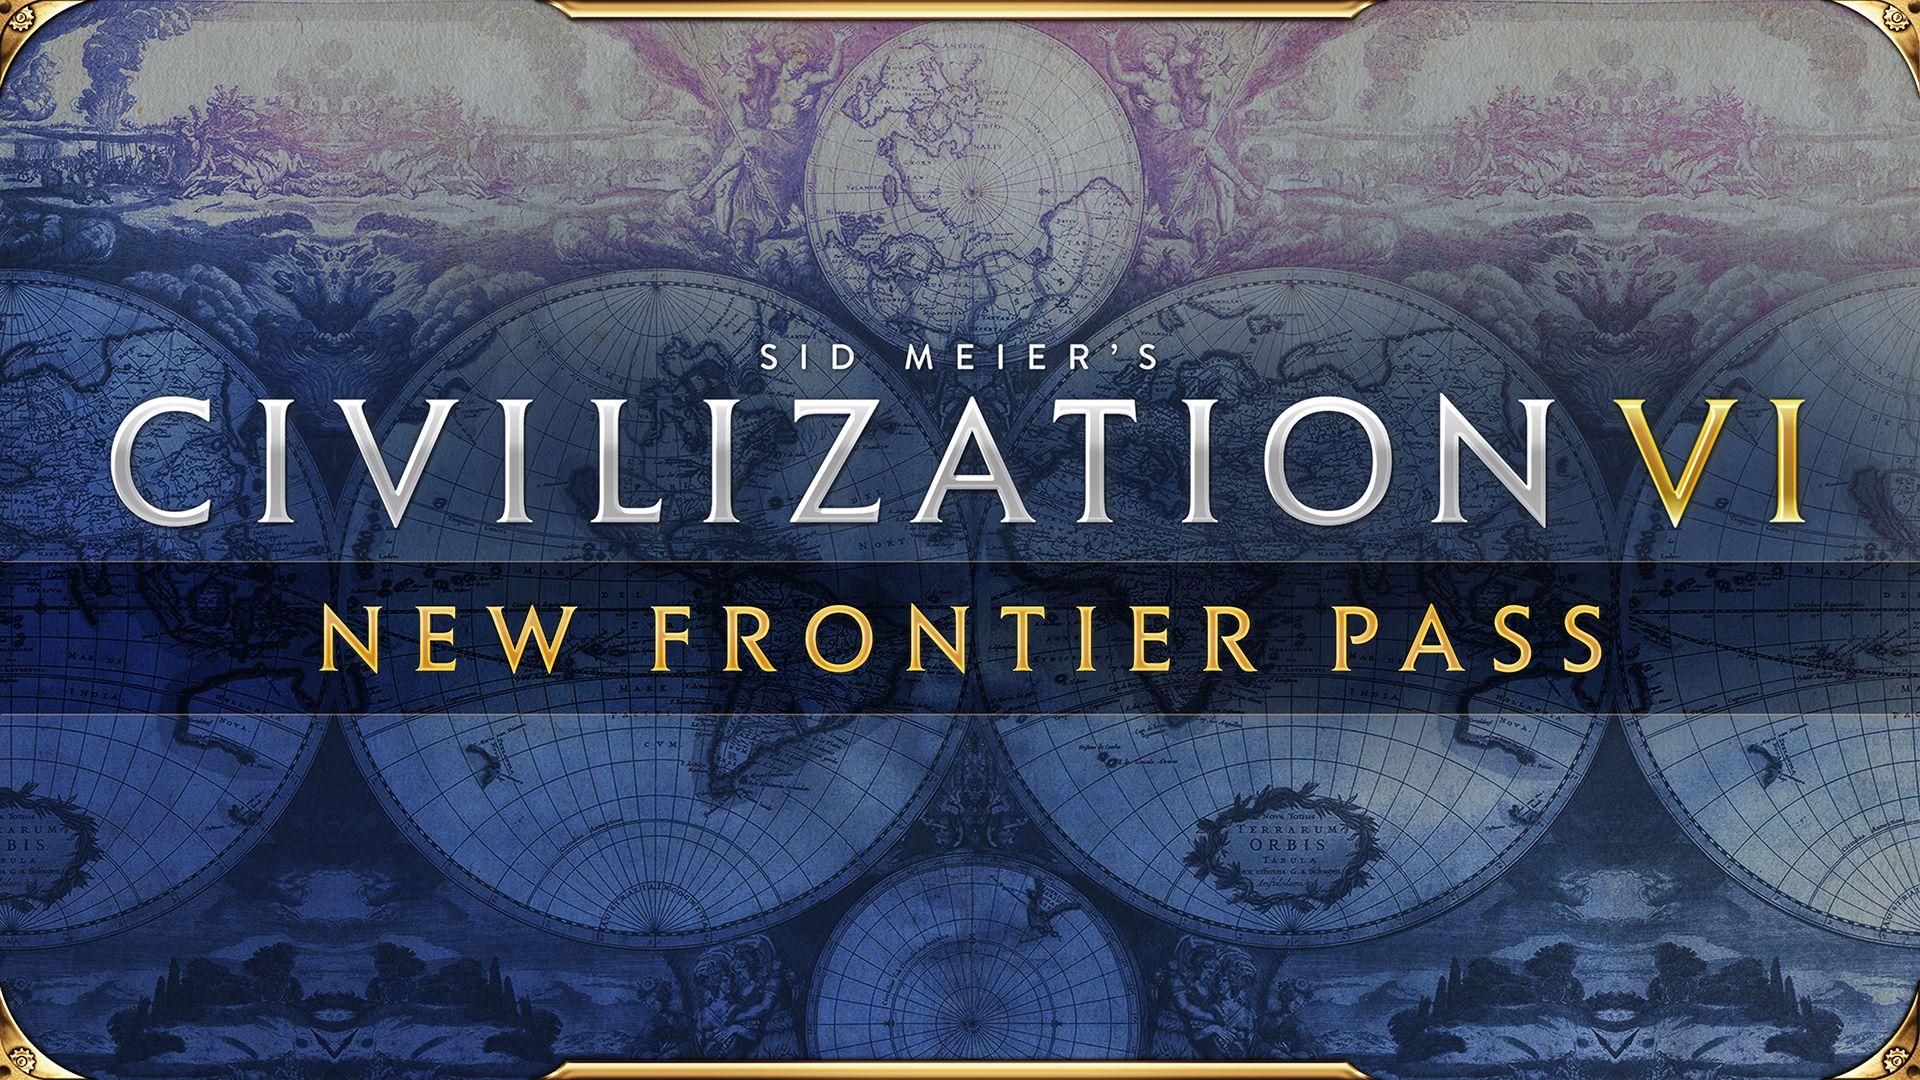 Aspyr Announces Sid Meier's Civilization VI - New Frontier Pass Will Arrive August 24 on iOS